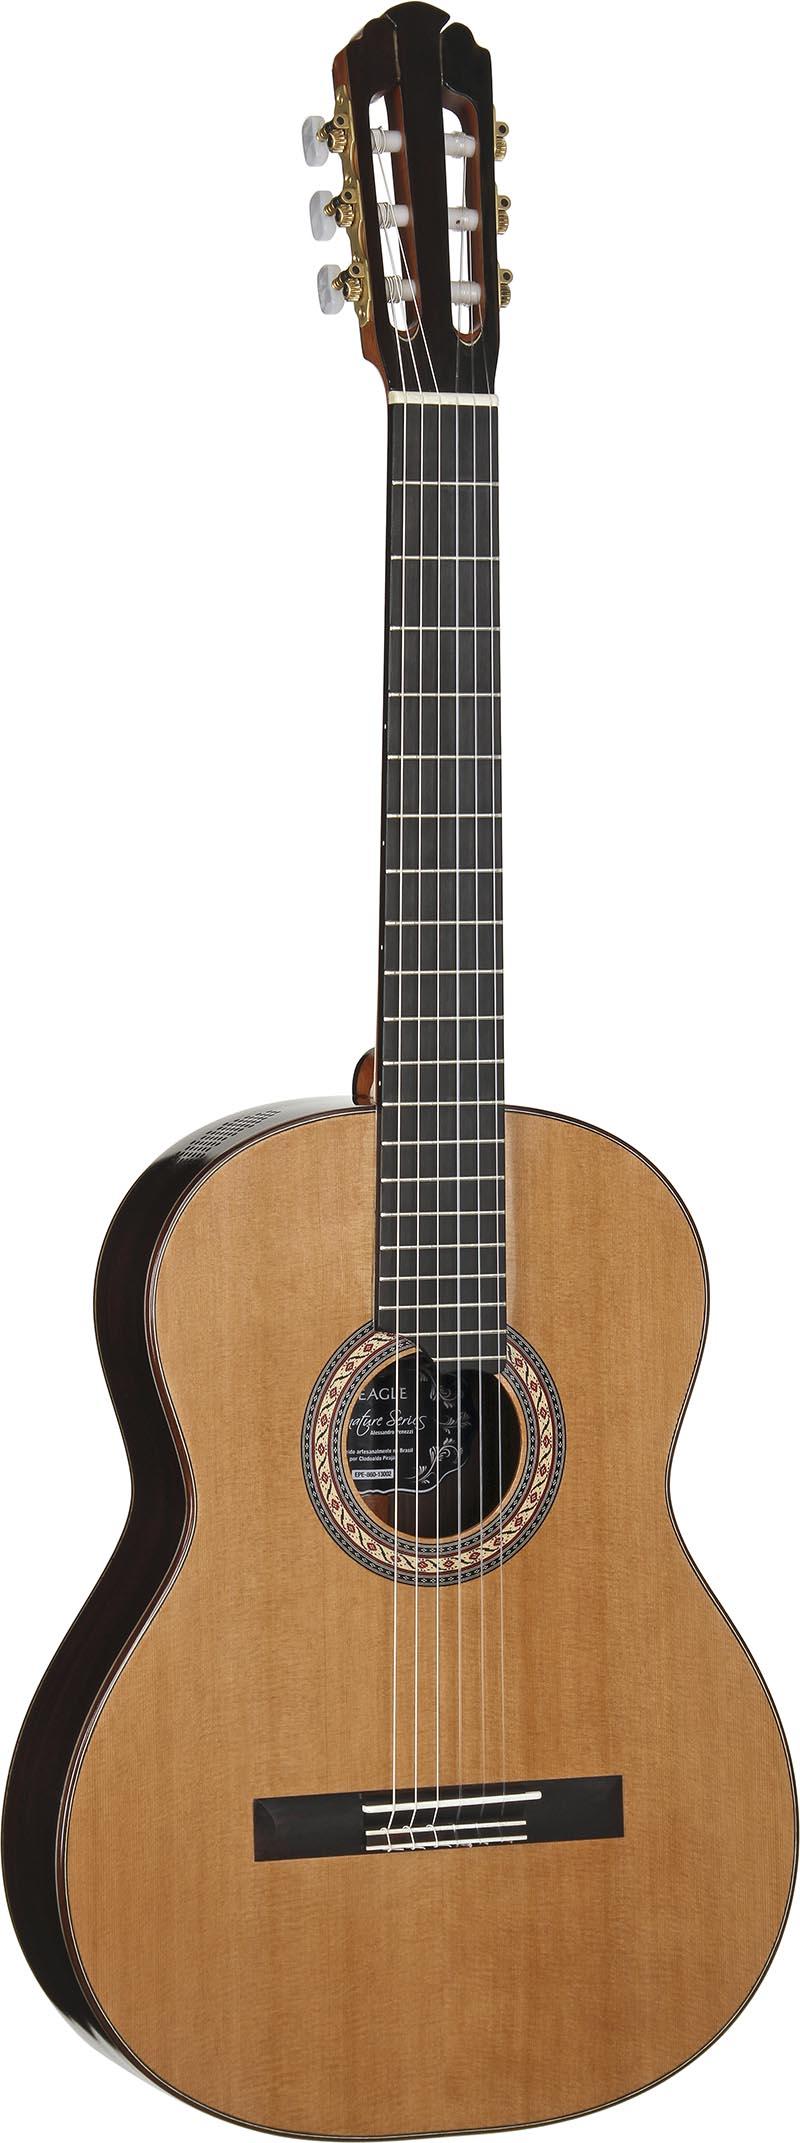 epe860 violao classico luthier eagle alessandro penezzi epe860 visao frontal vertical